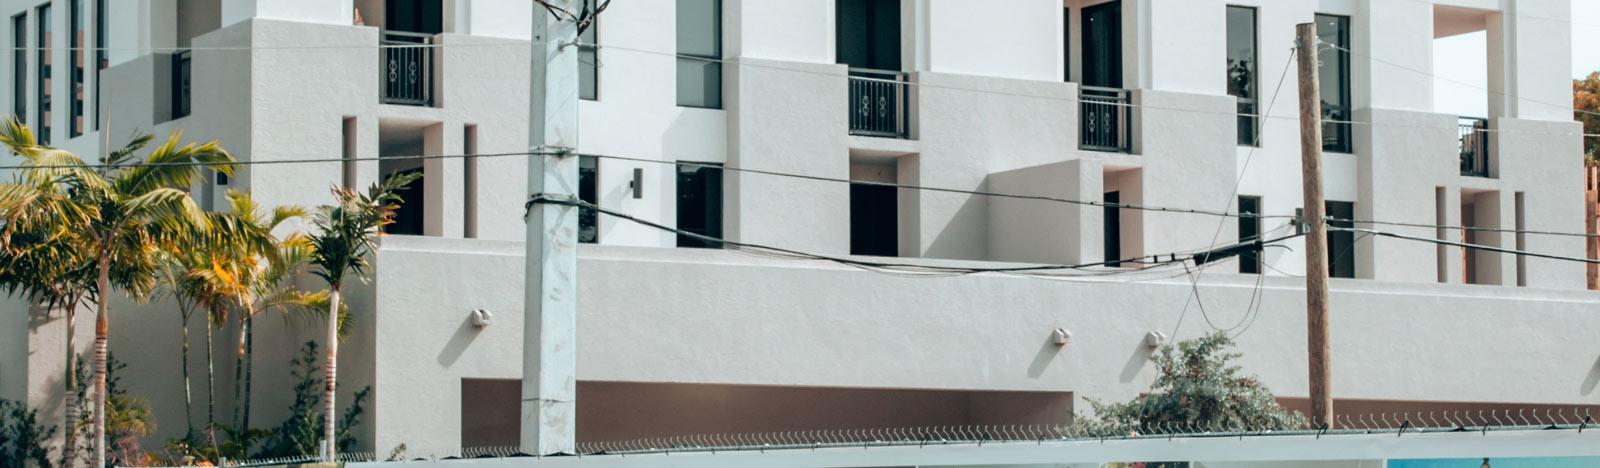 Banner of Apartment Developments